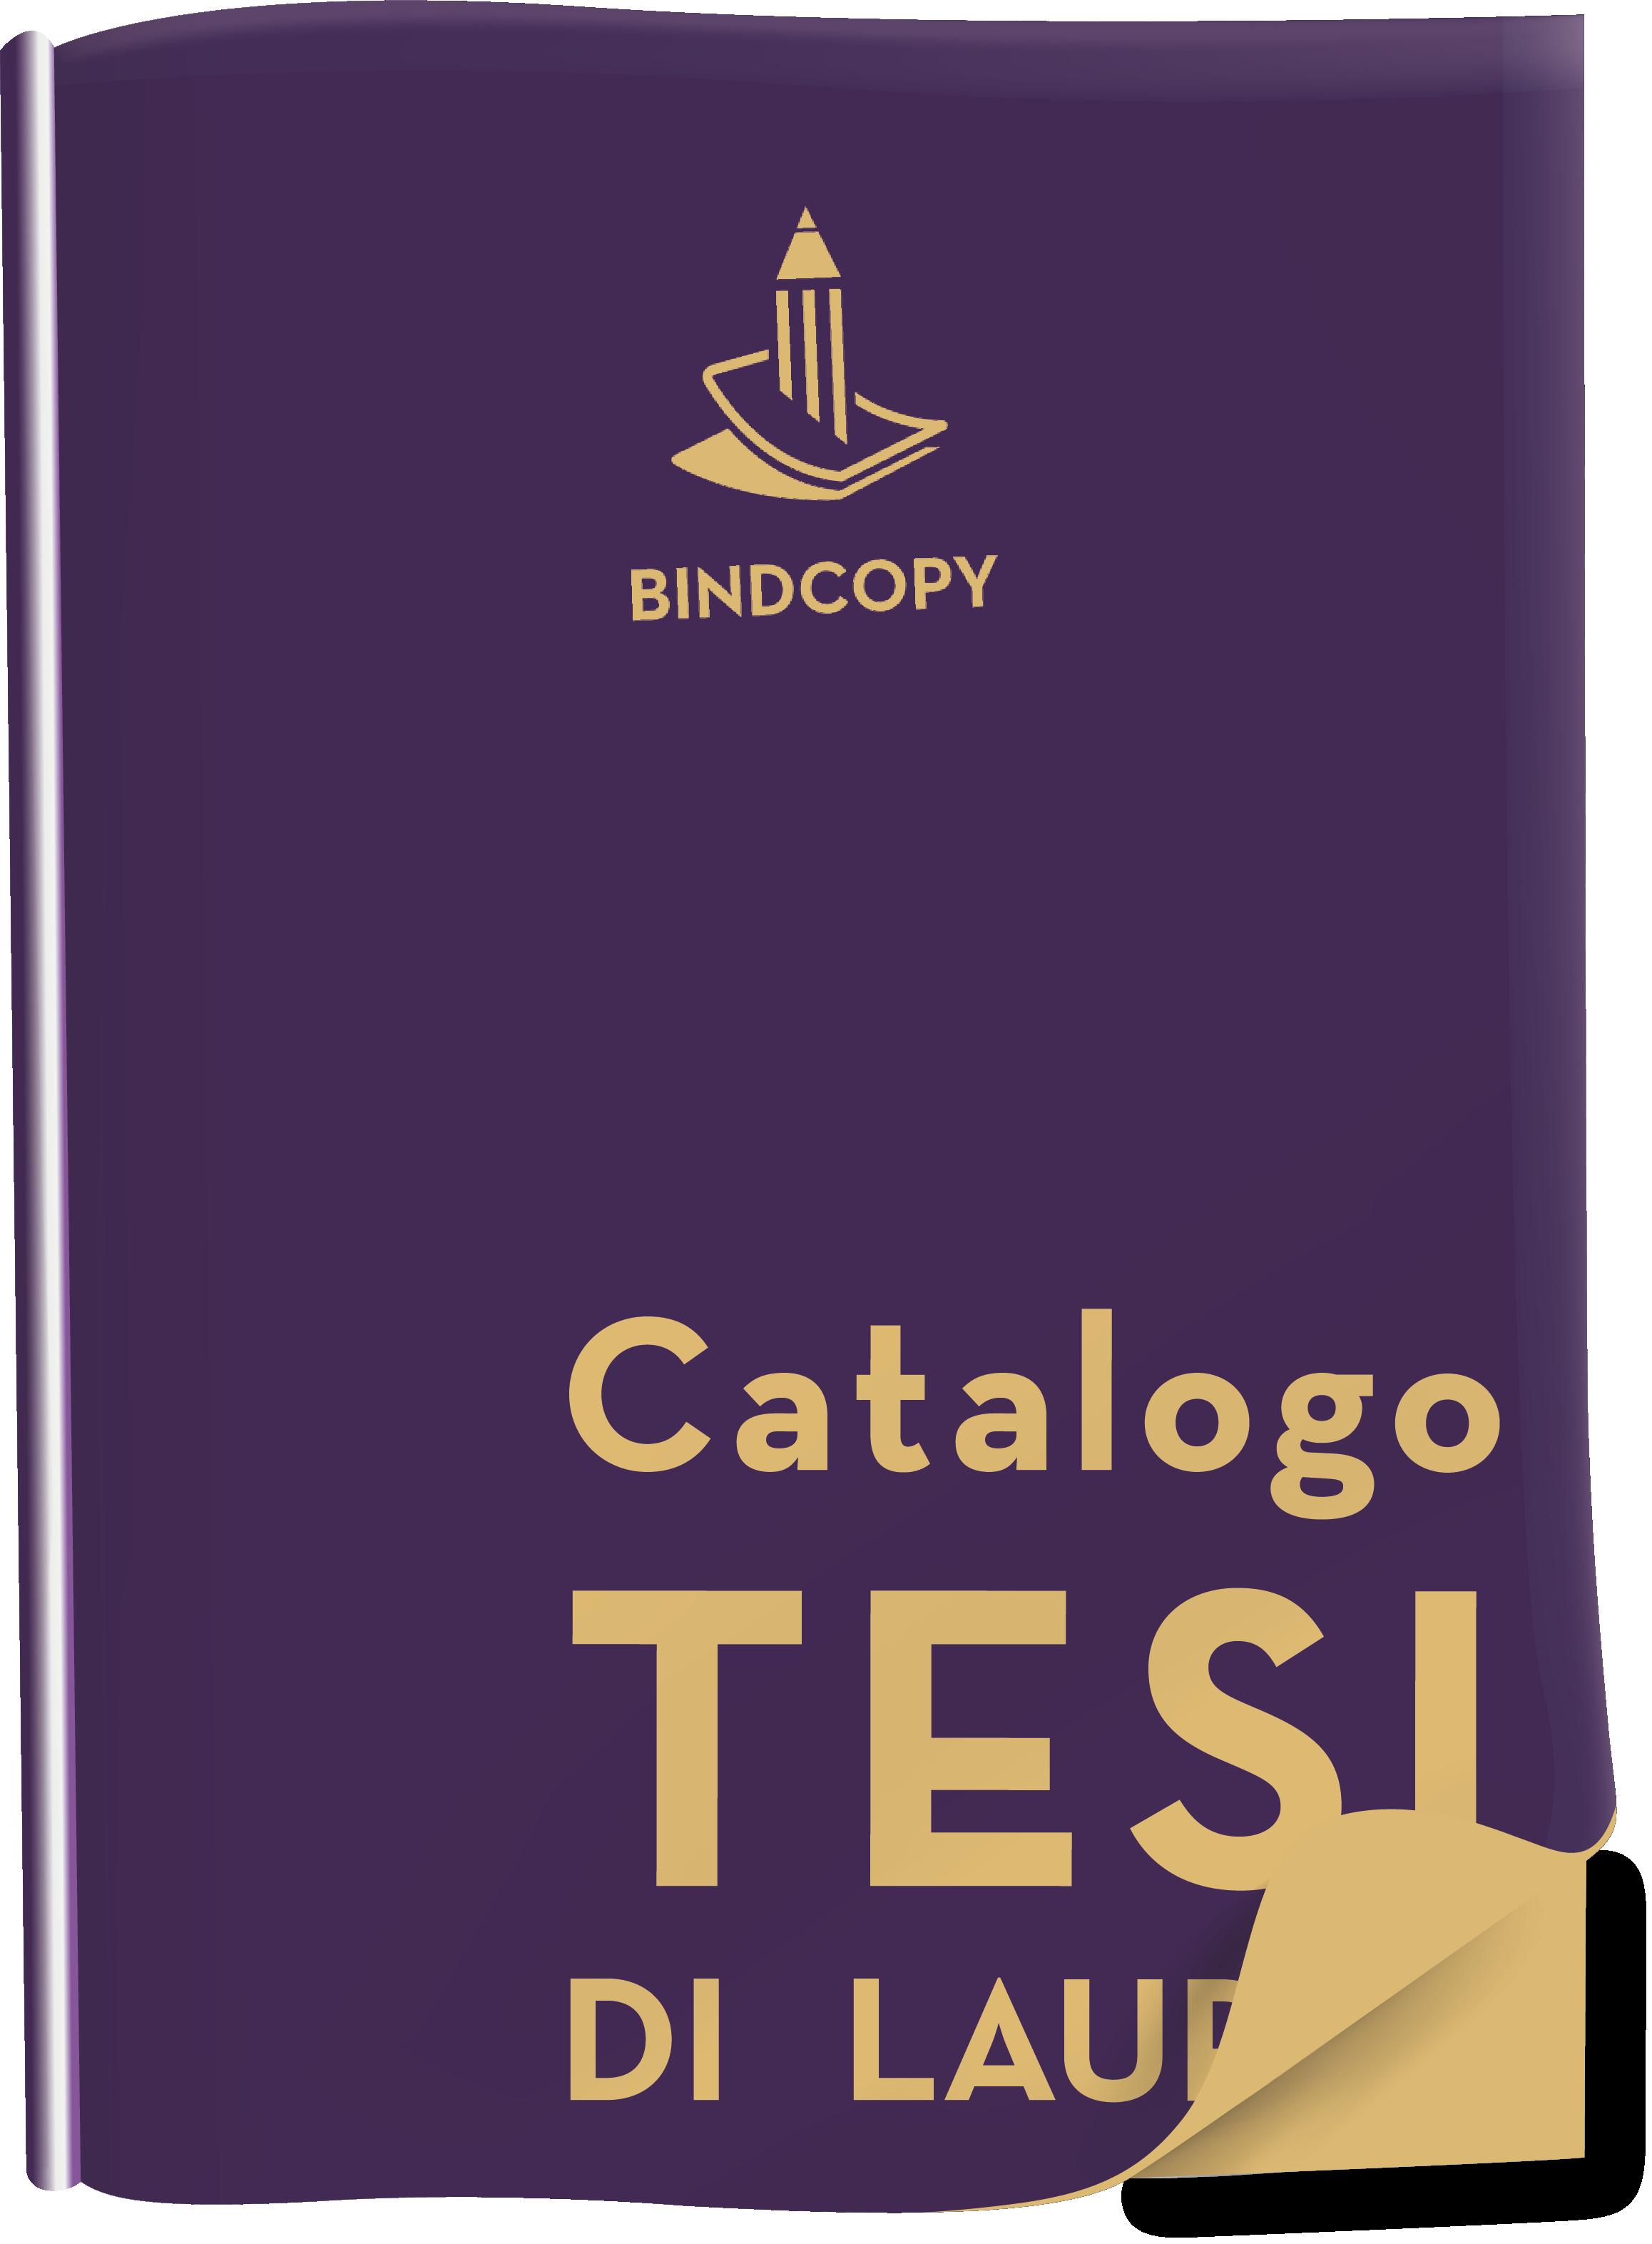 Cover catalogo Tesi di laurea BINDCOPY copisteria legatoria artigianale